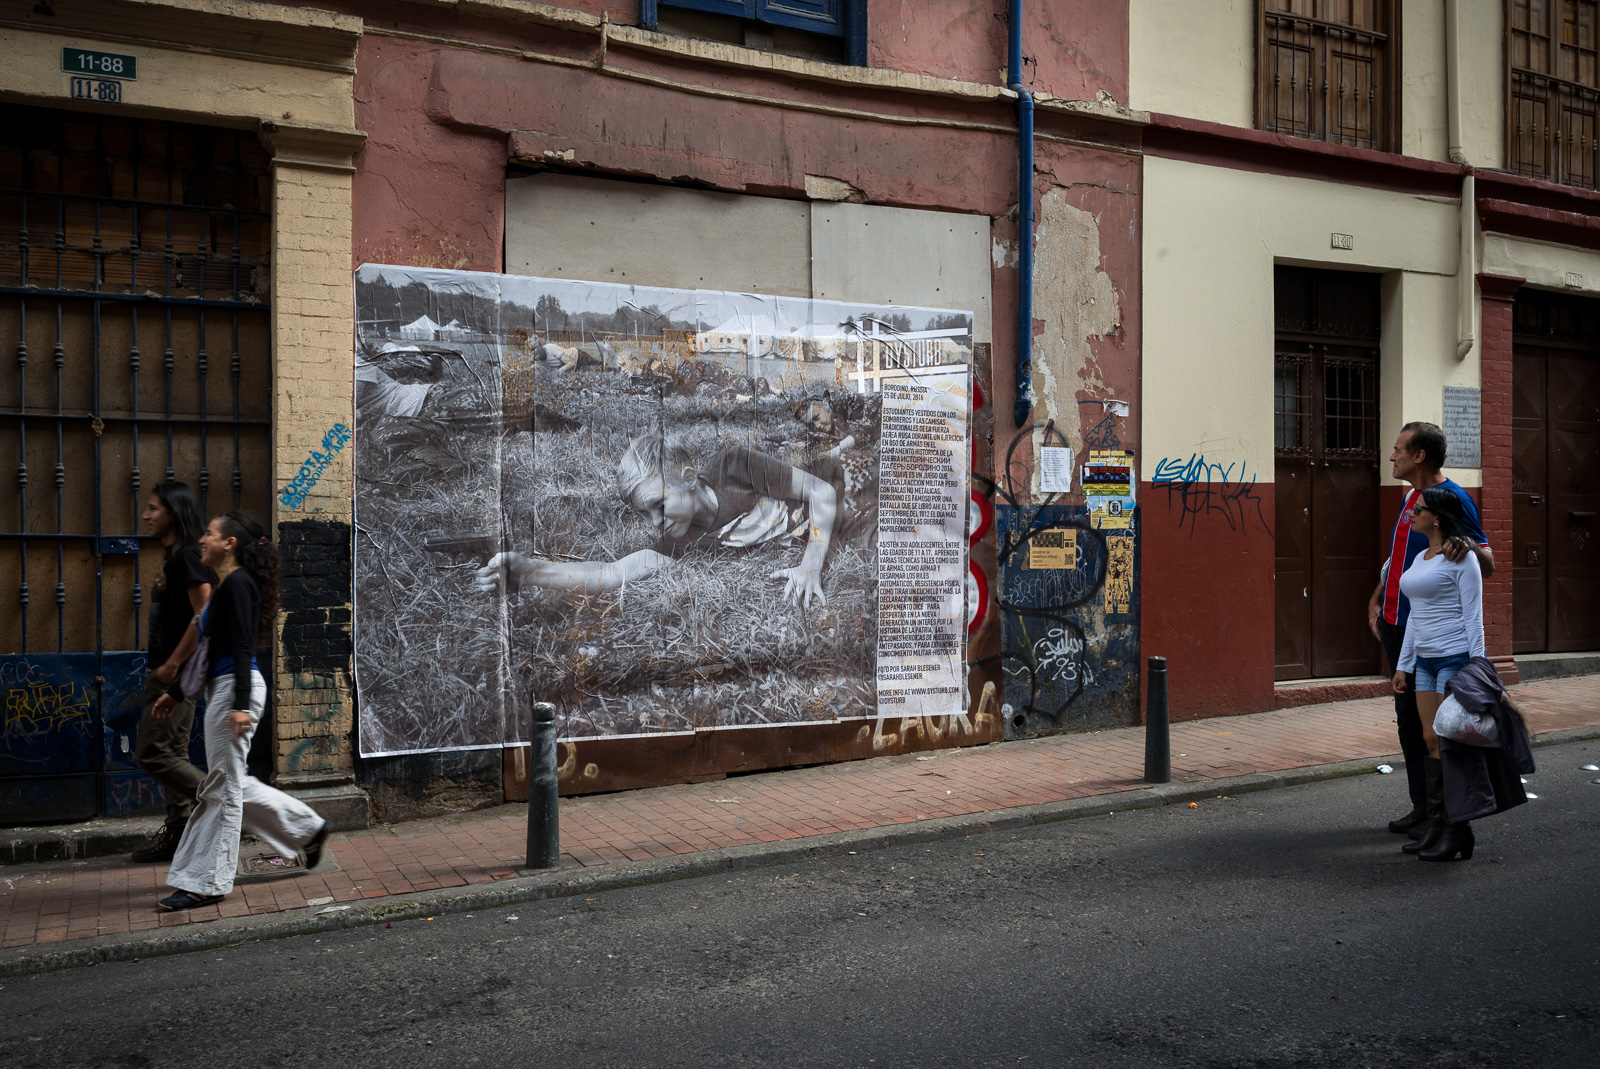 20161030-colombia-1001522.jpg